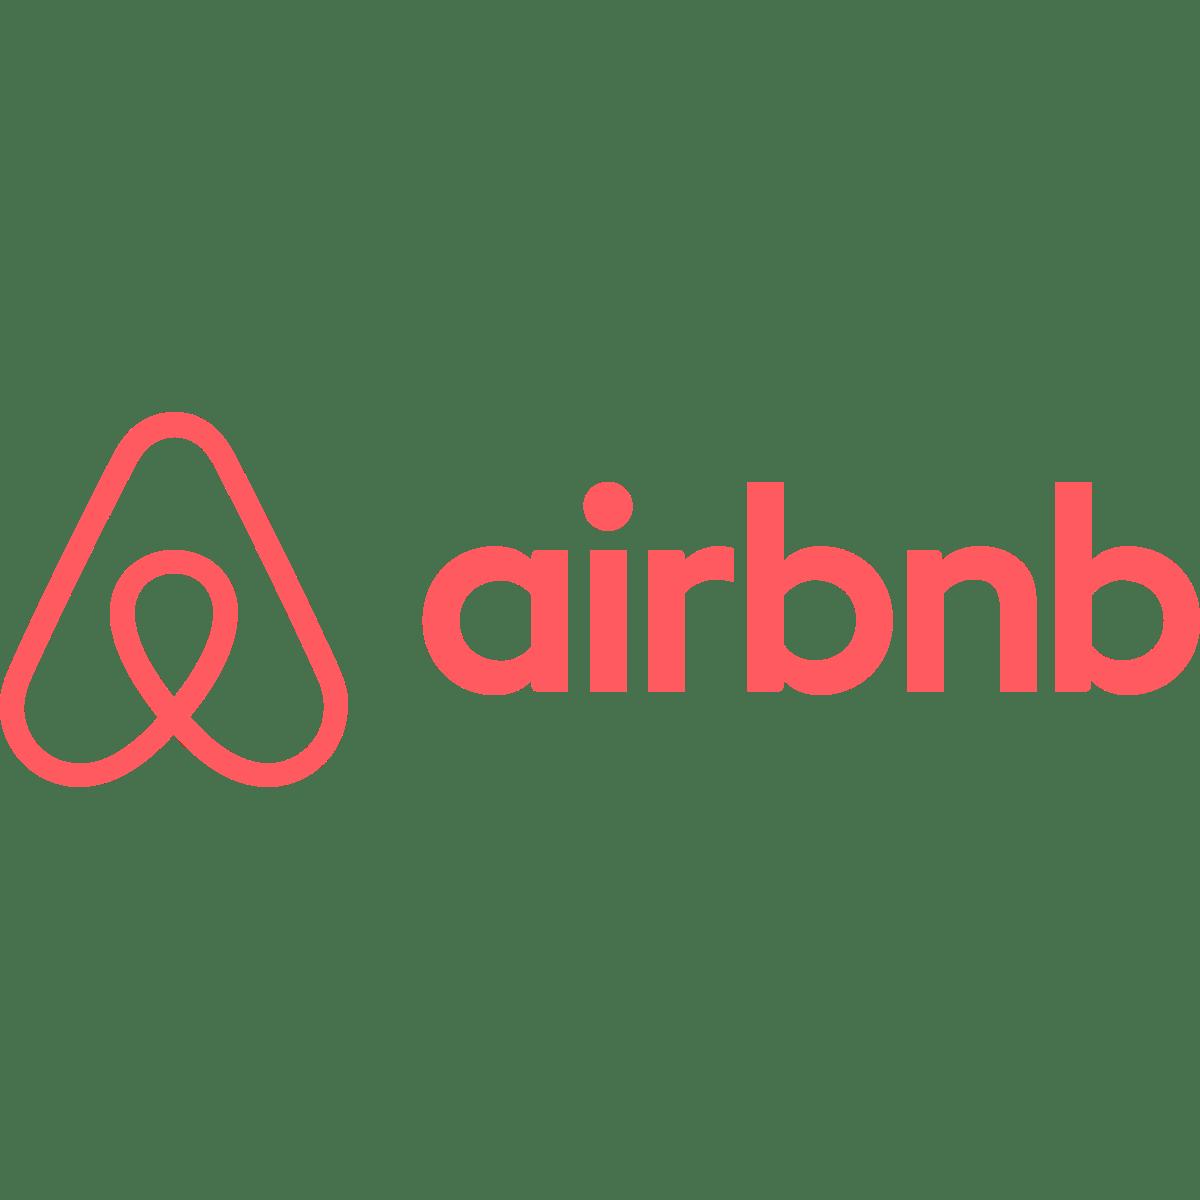 airbnb | Fundamentale Aktienanalyse